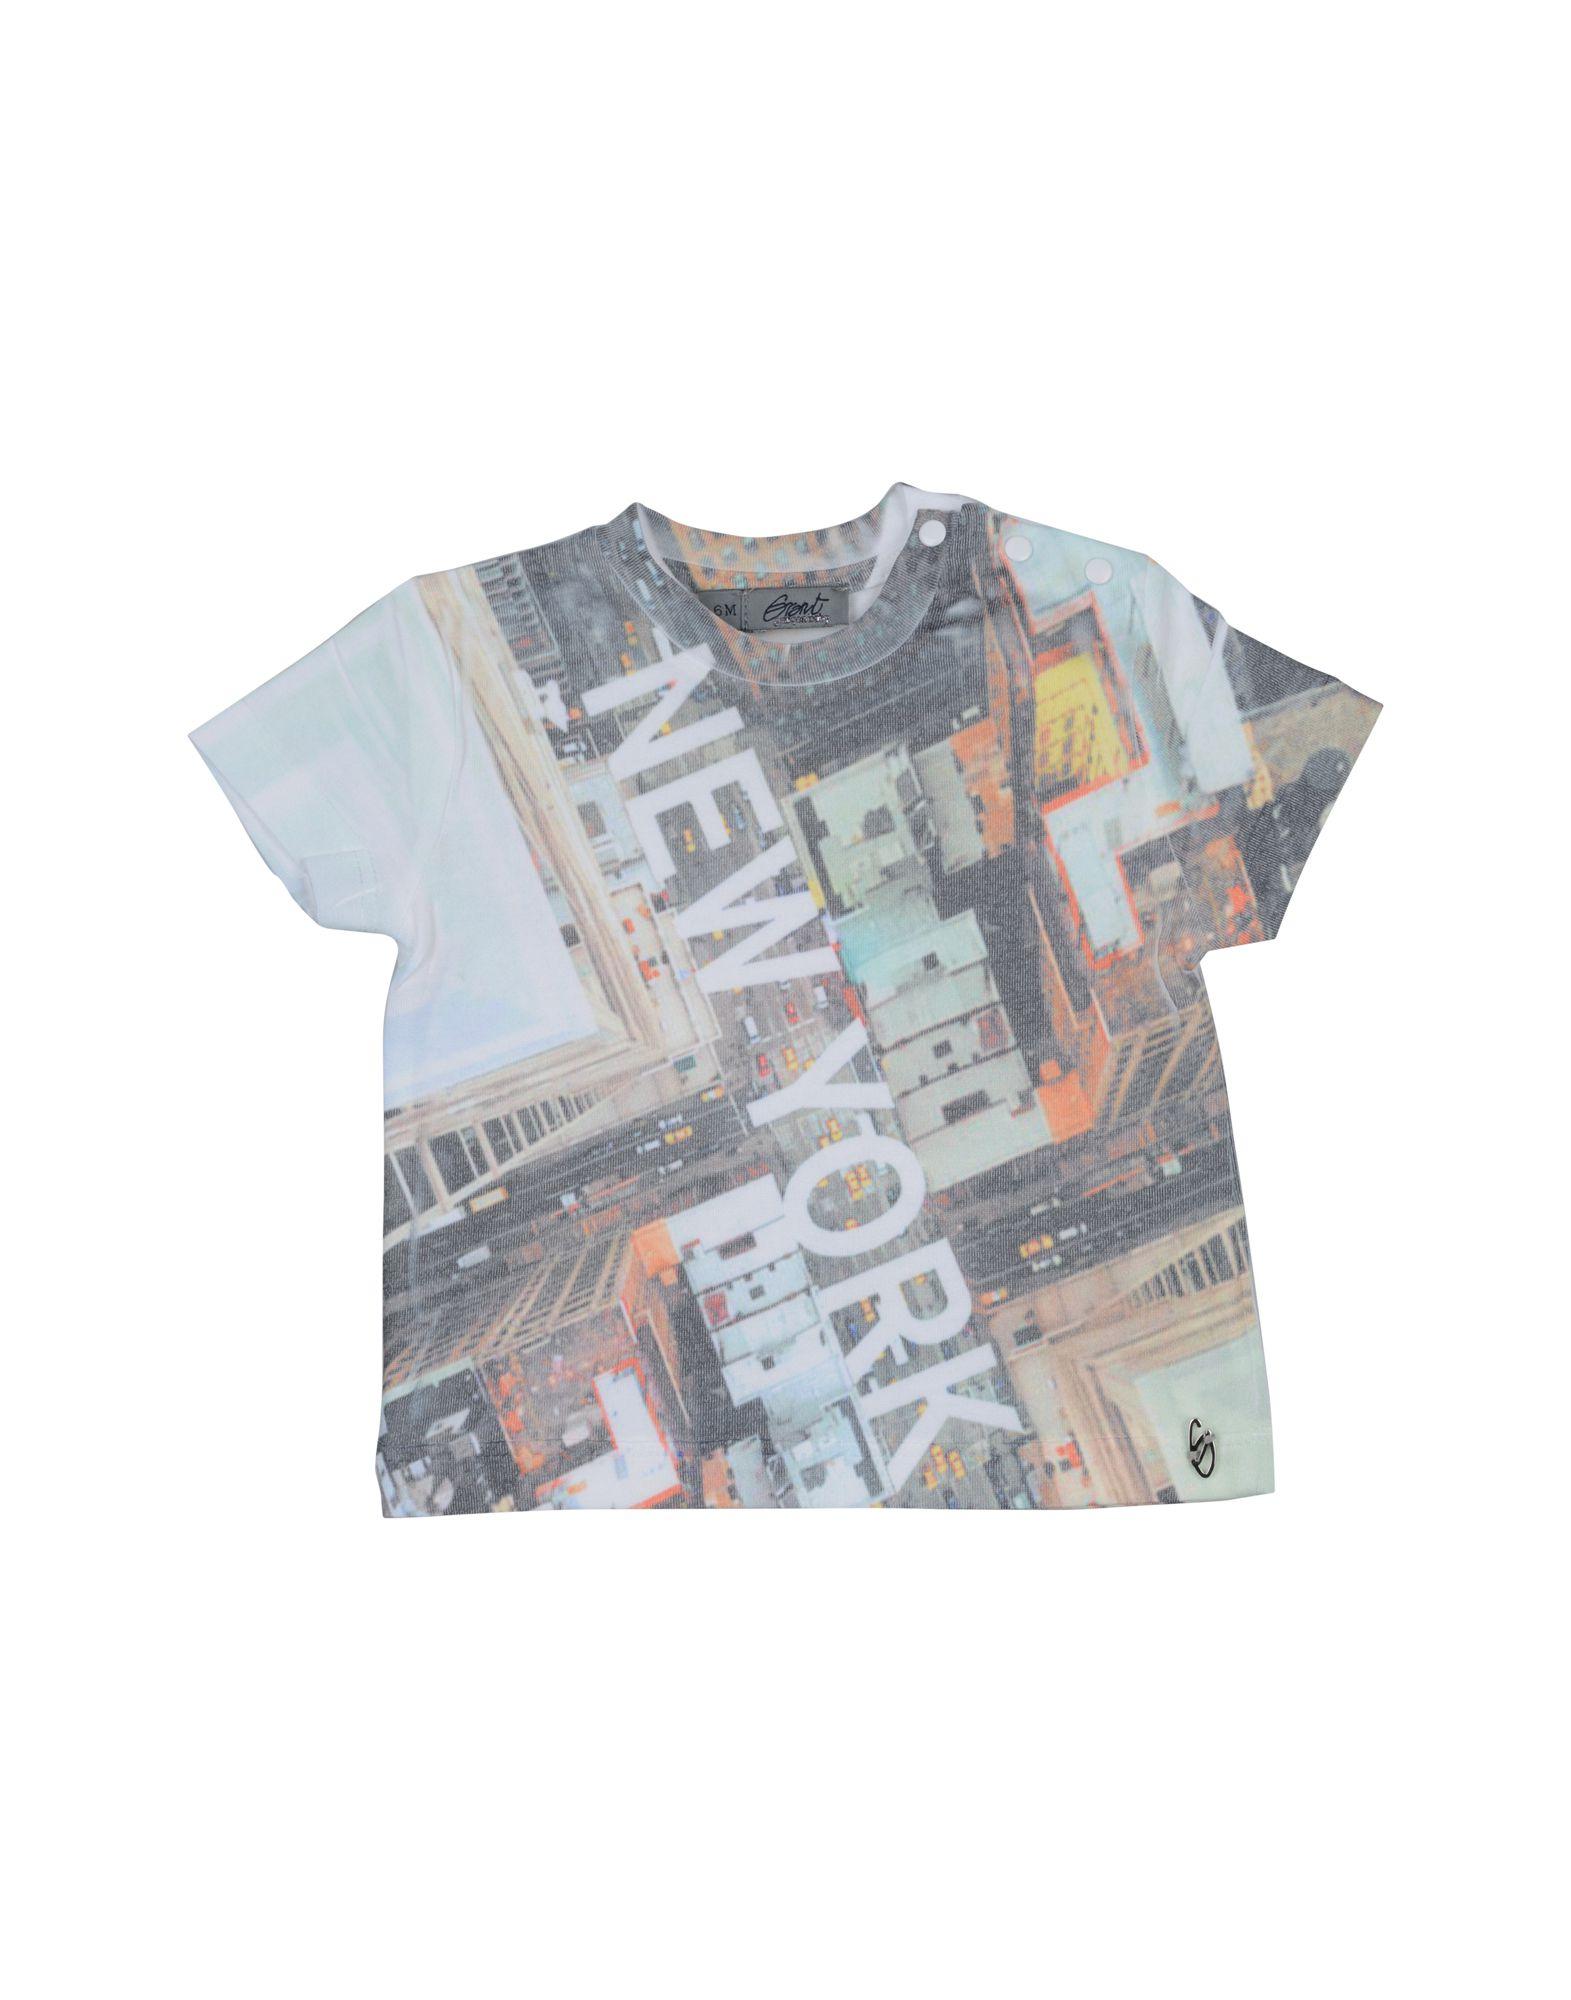 Grant Garçon Baby Kids' T-shirts In Light Green